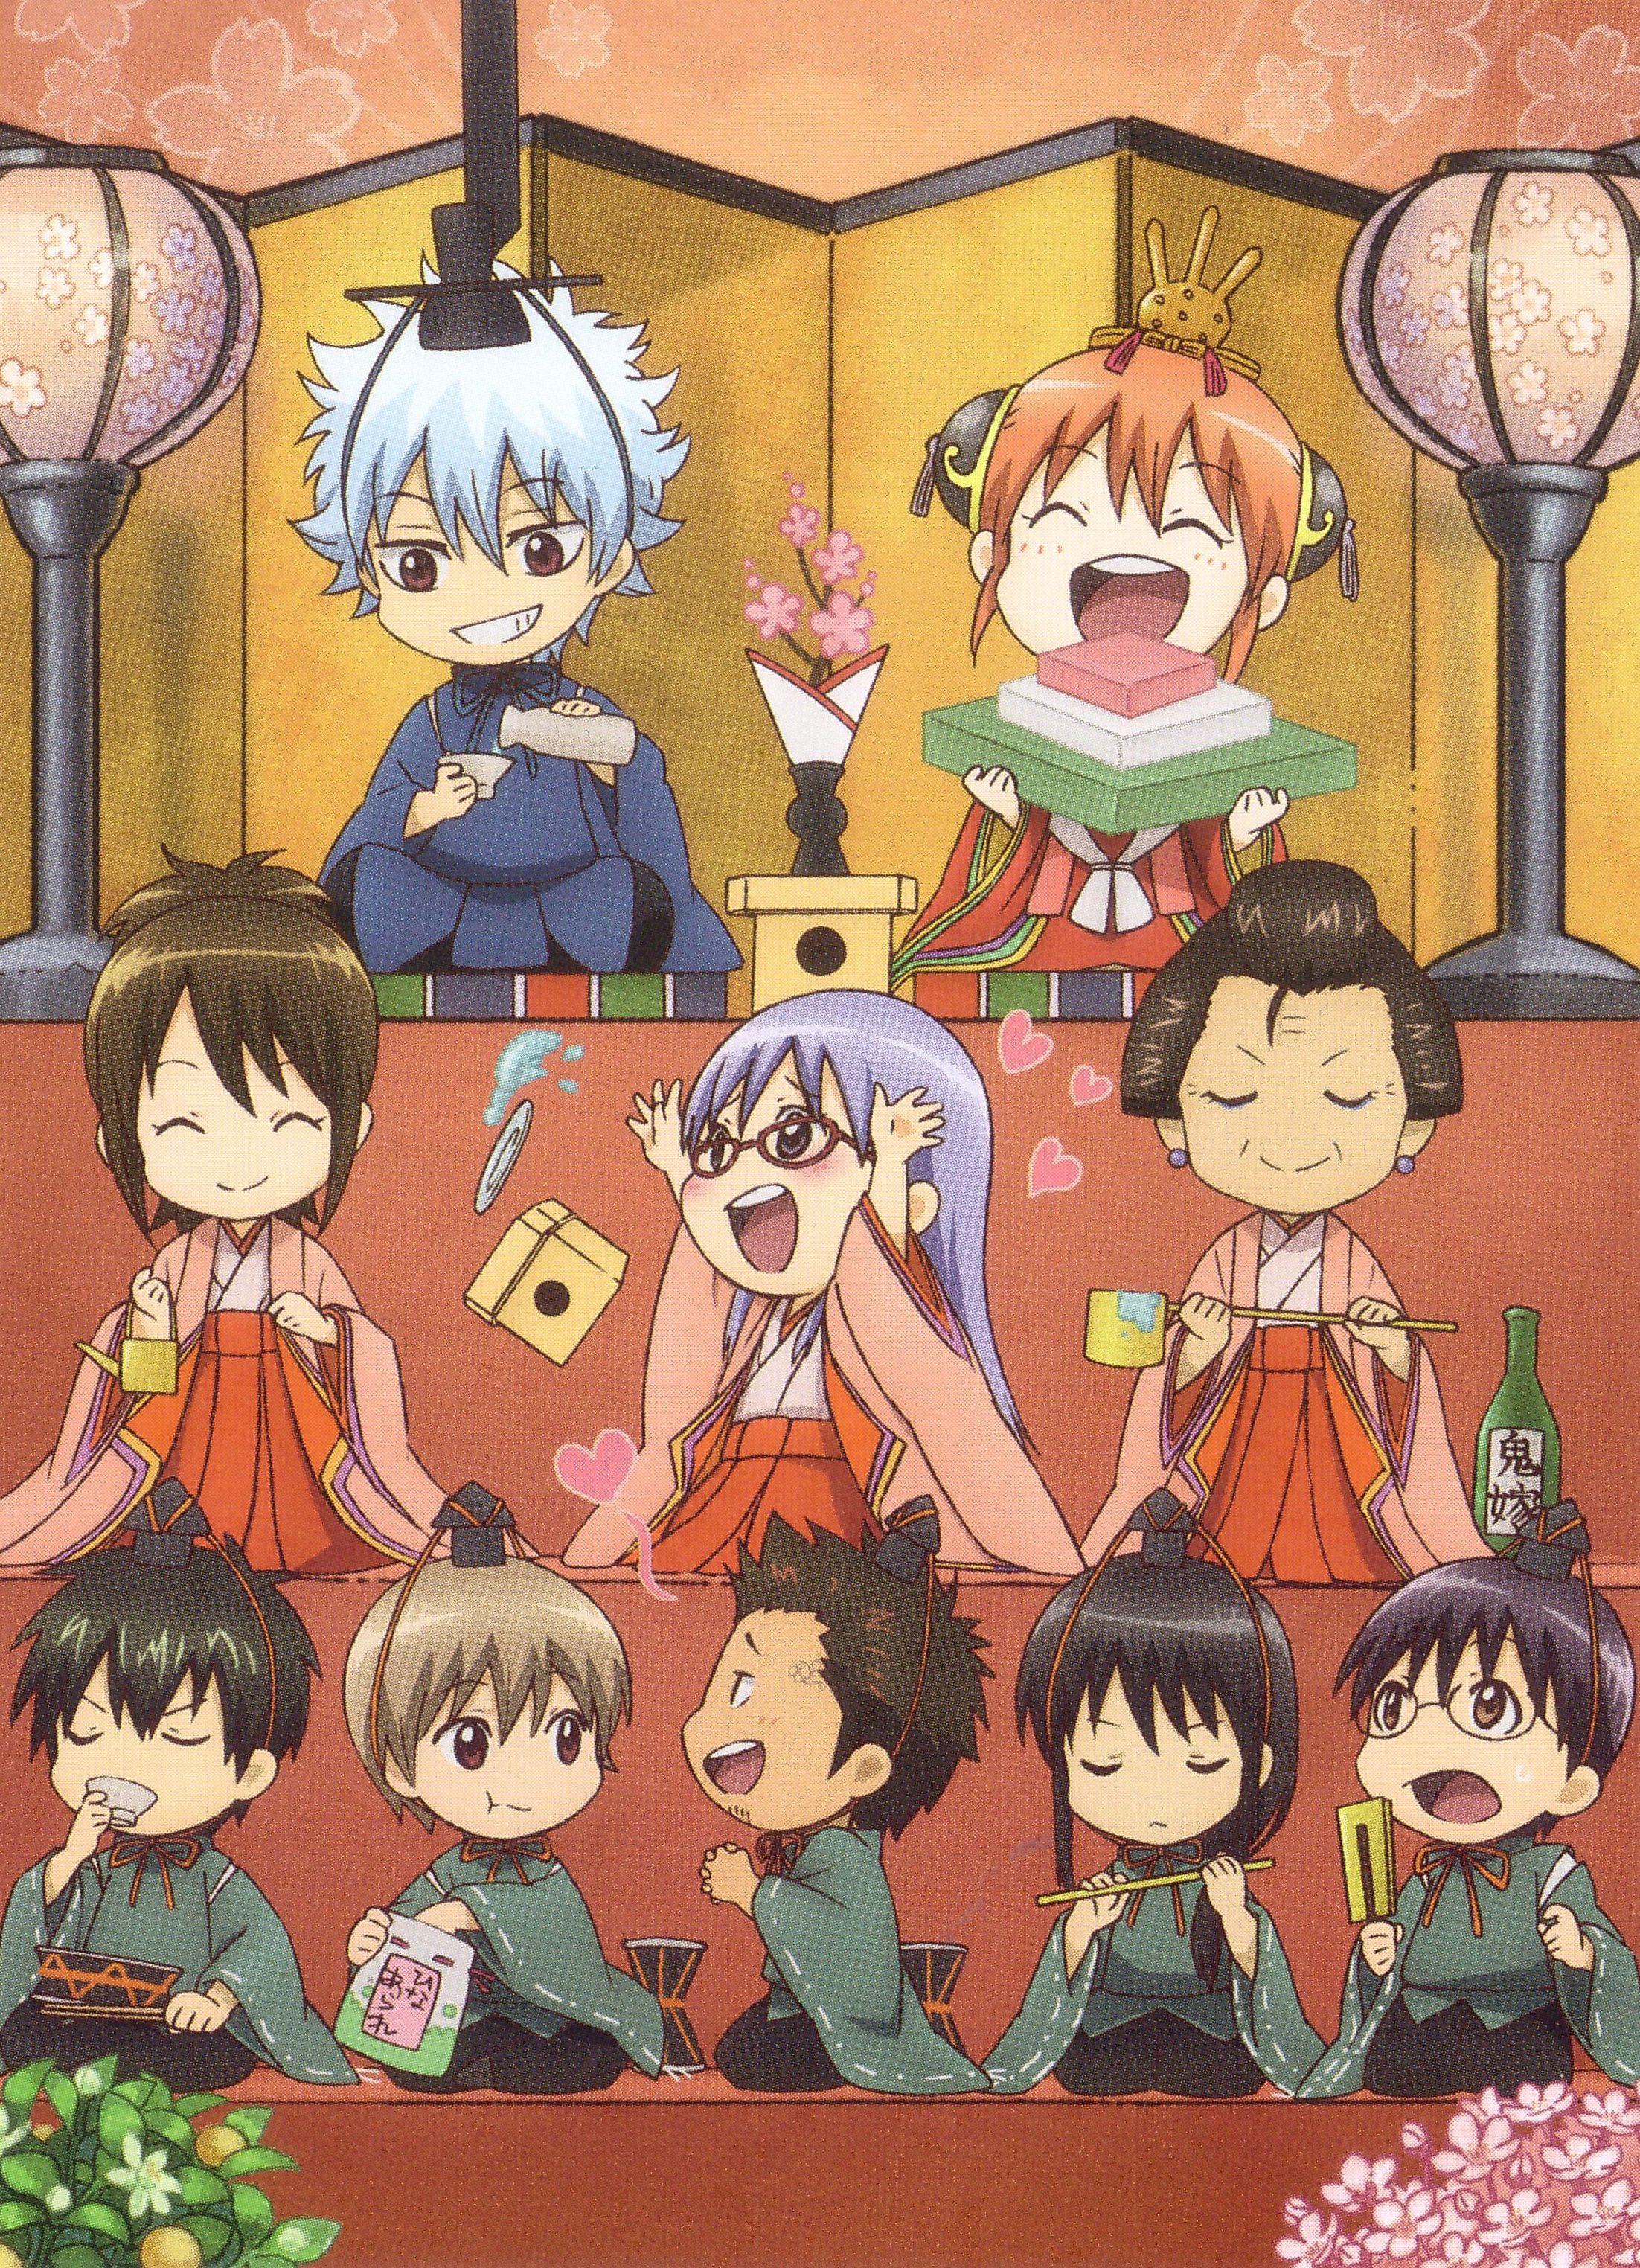 Tags Gin Tama, Hijikata Toushirou, Otose (Gin Tama